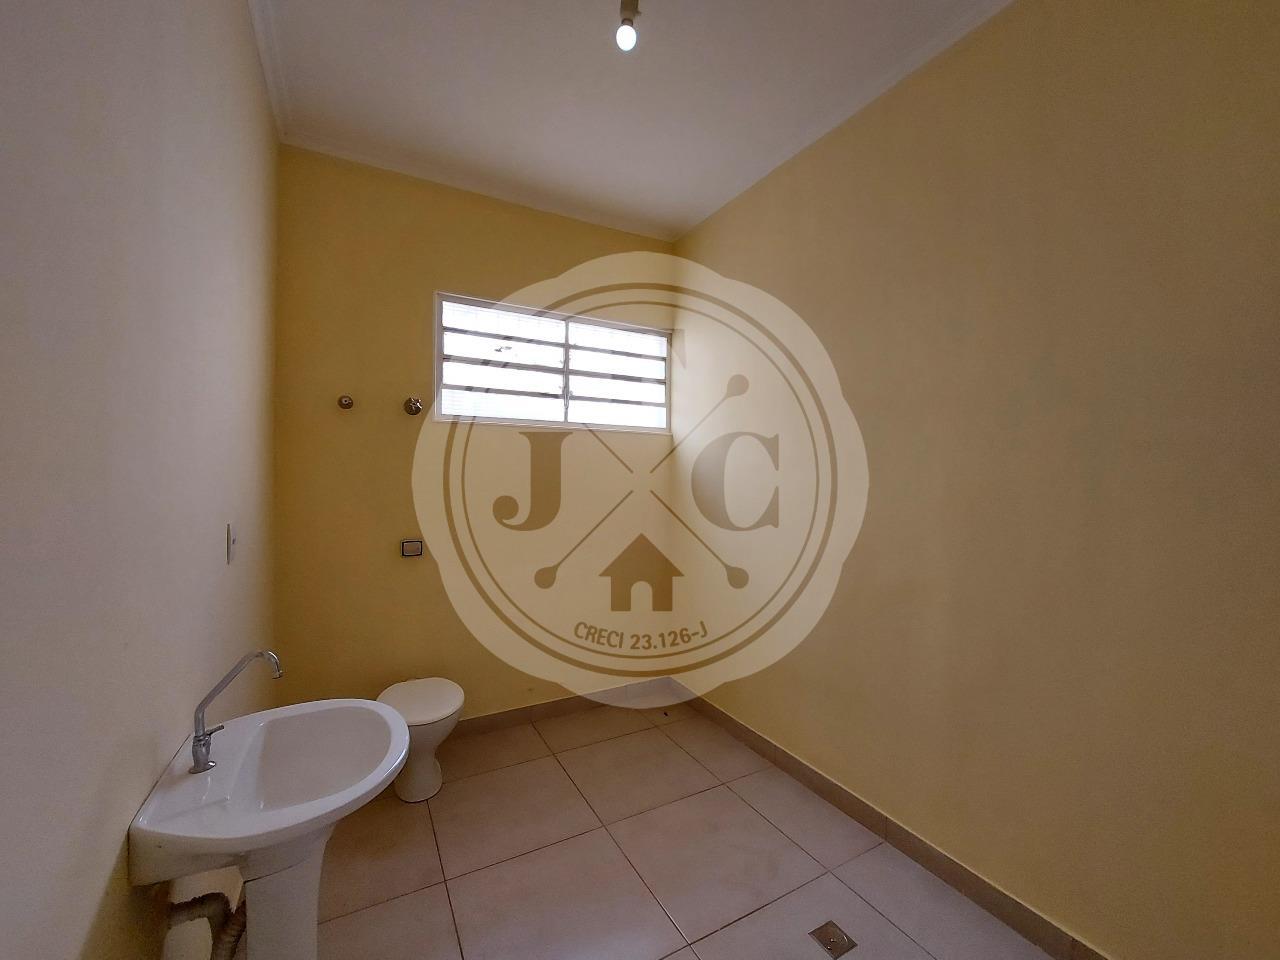 Casa para aluguel no Alto da Boa Vista: Banheiro